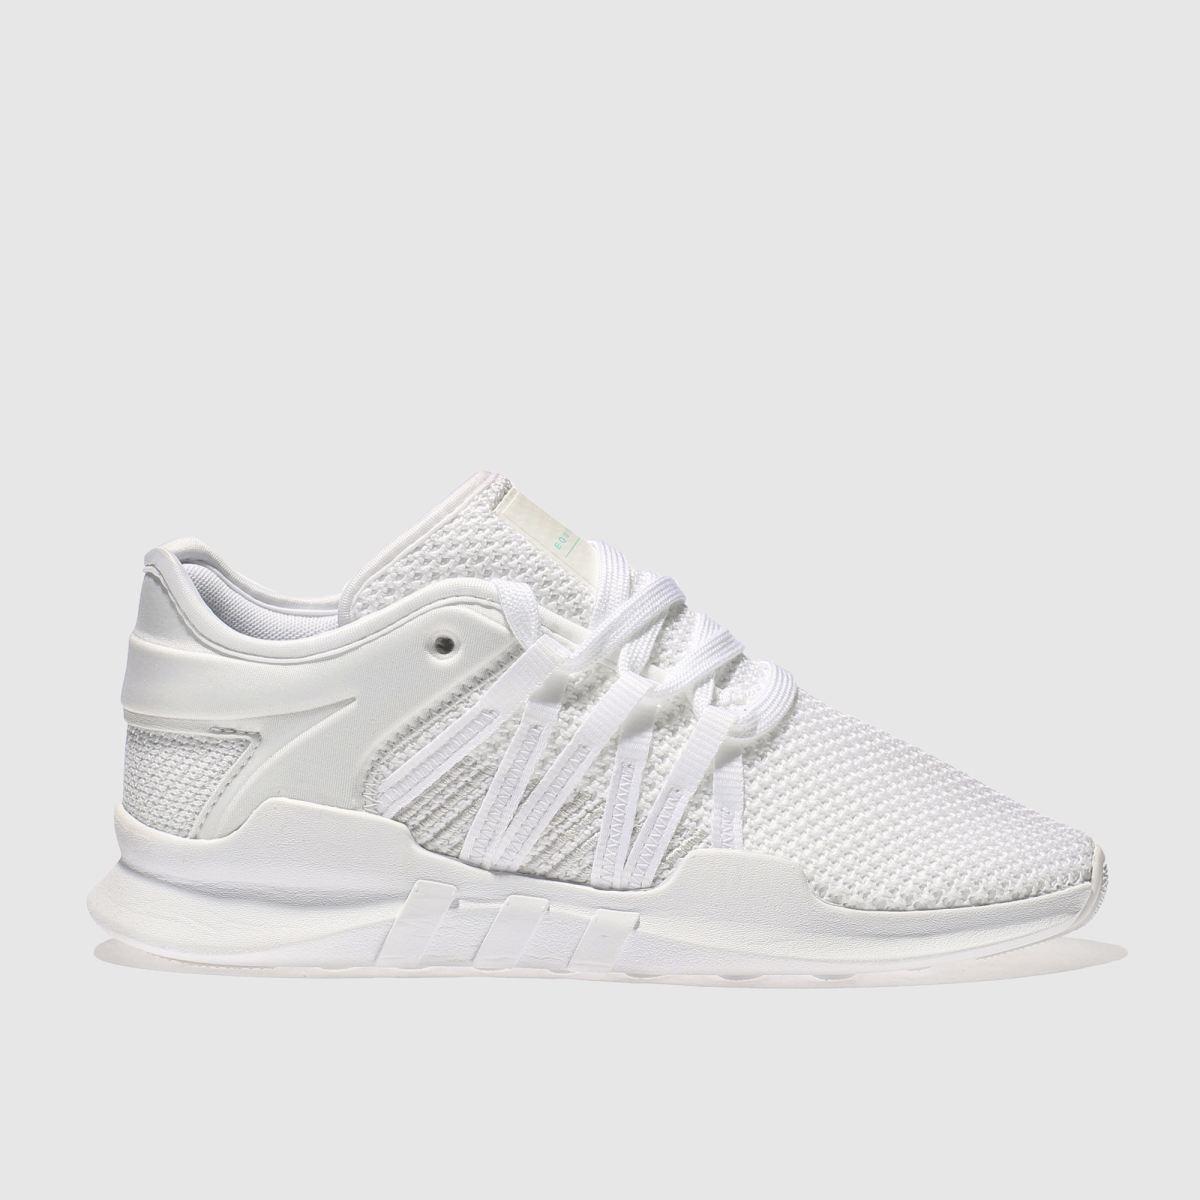 adidas white eqt racing adv trainers